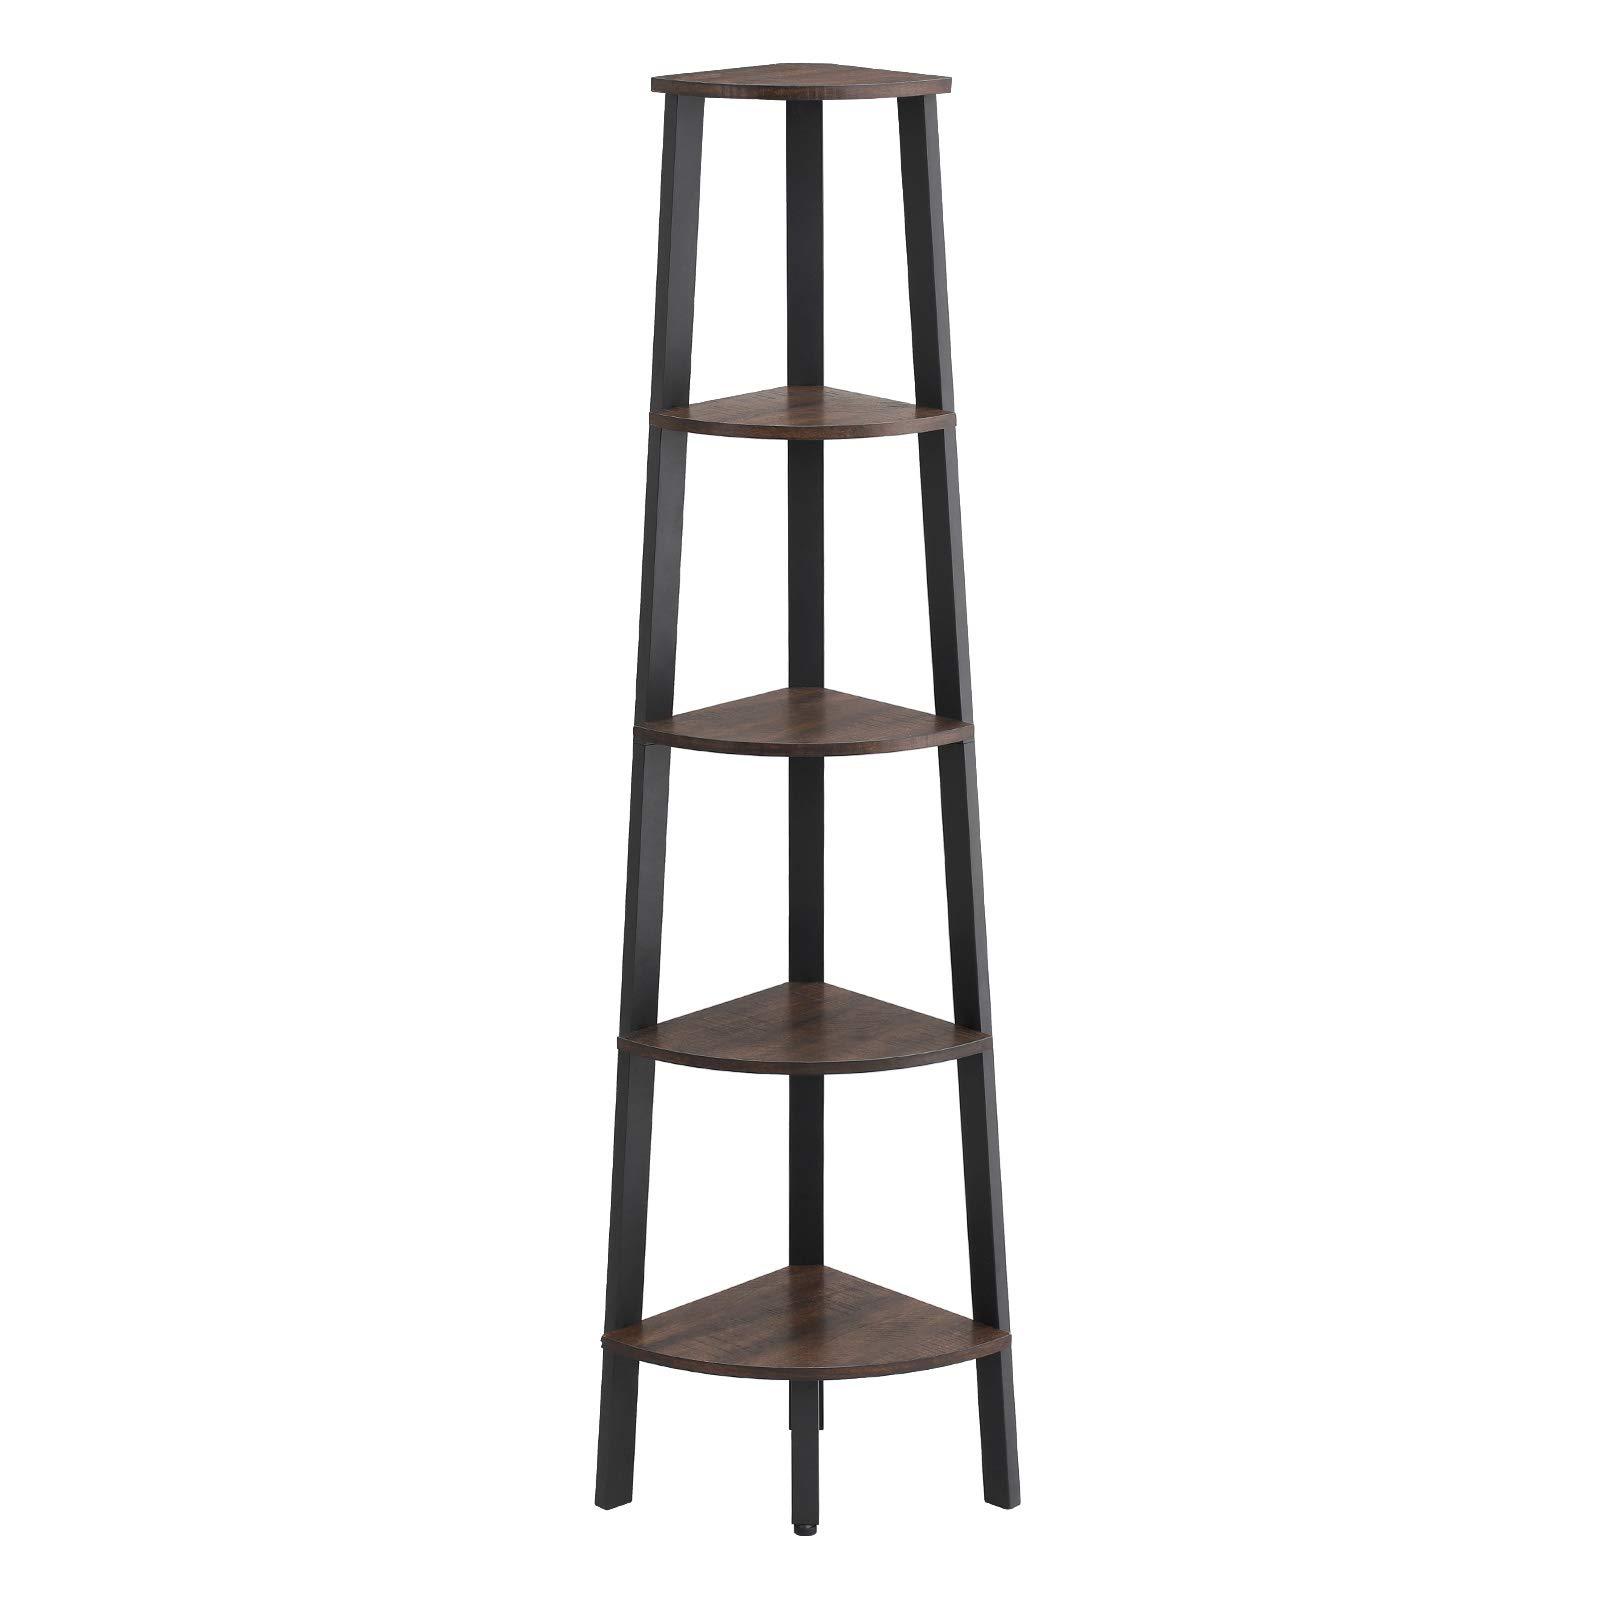 VASAGLE Industrial Corner Shelf, 5-Tier Ladder Bookcase, Storage Rack, with Metal Frame, for Living Room, Home, Office, Rustic Dark Brown ULLS35BF